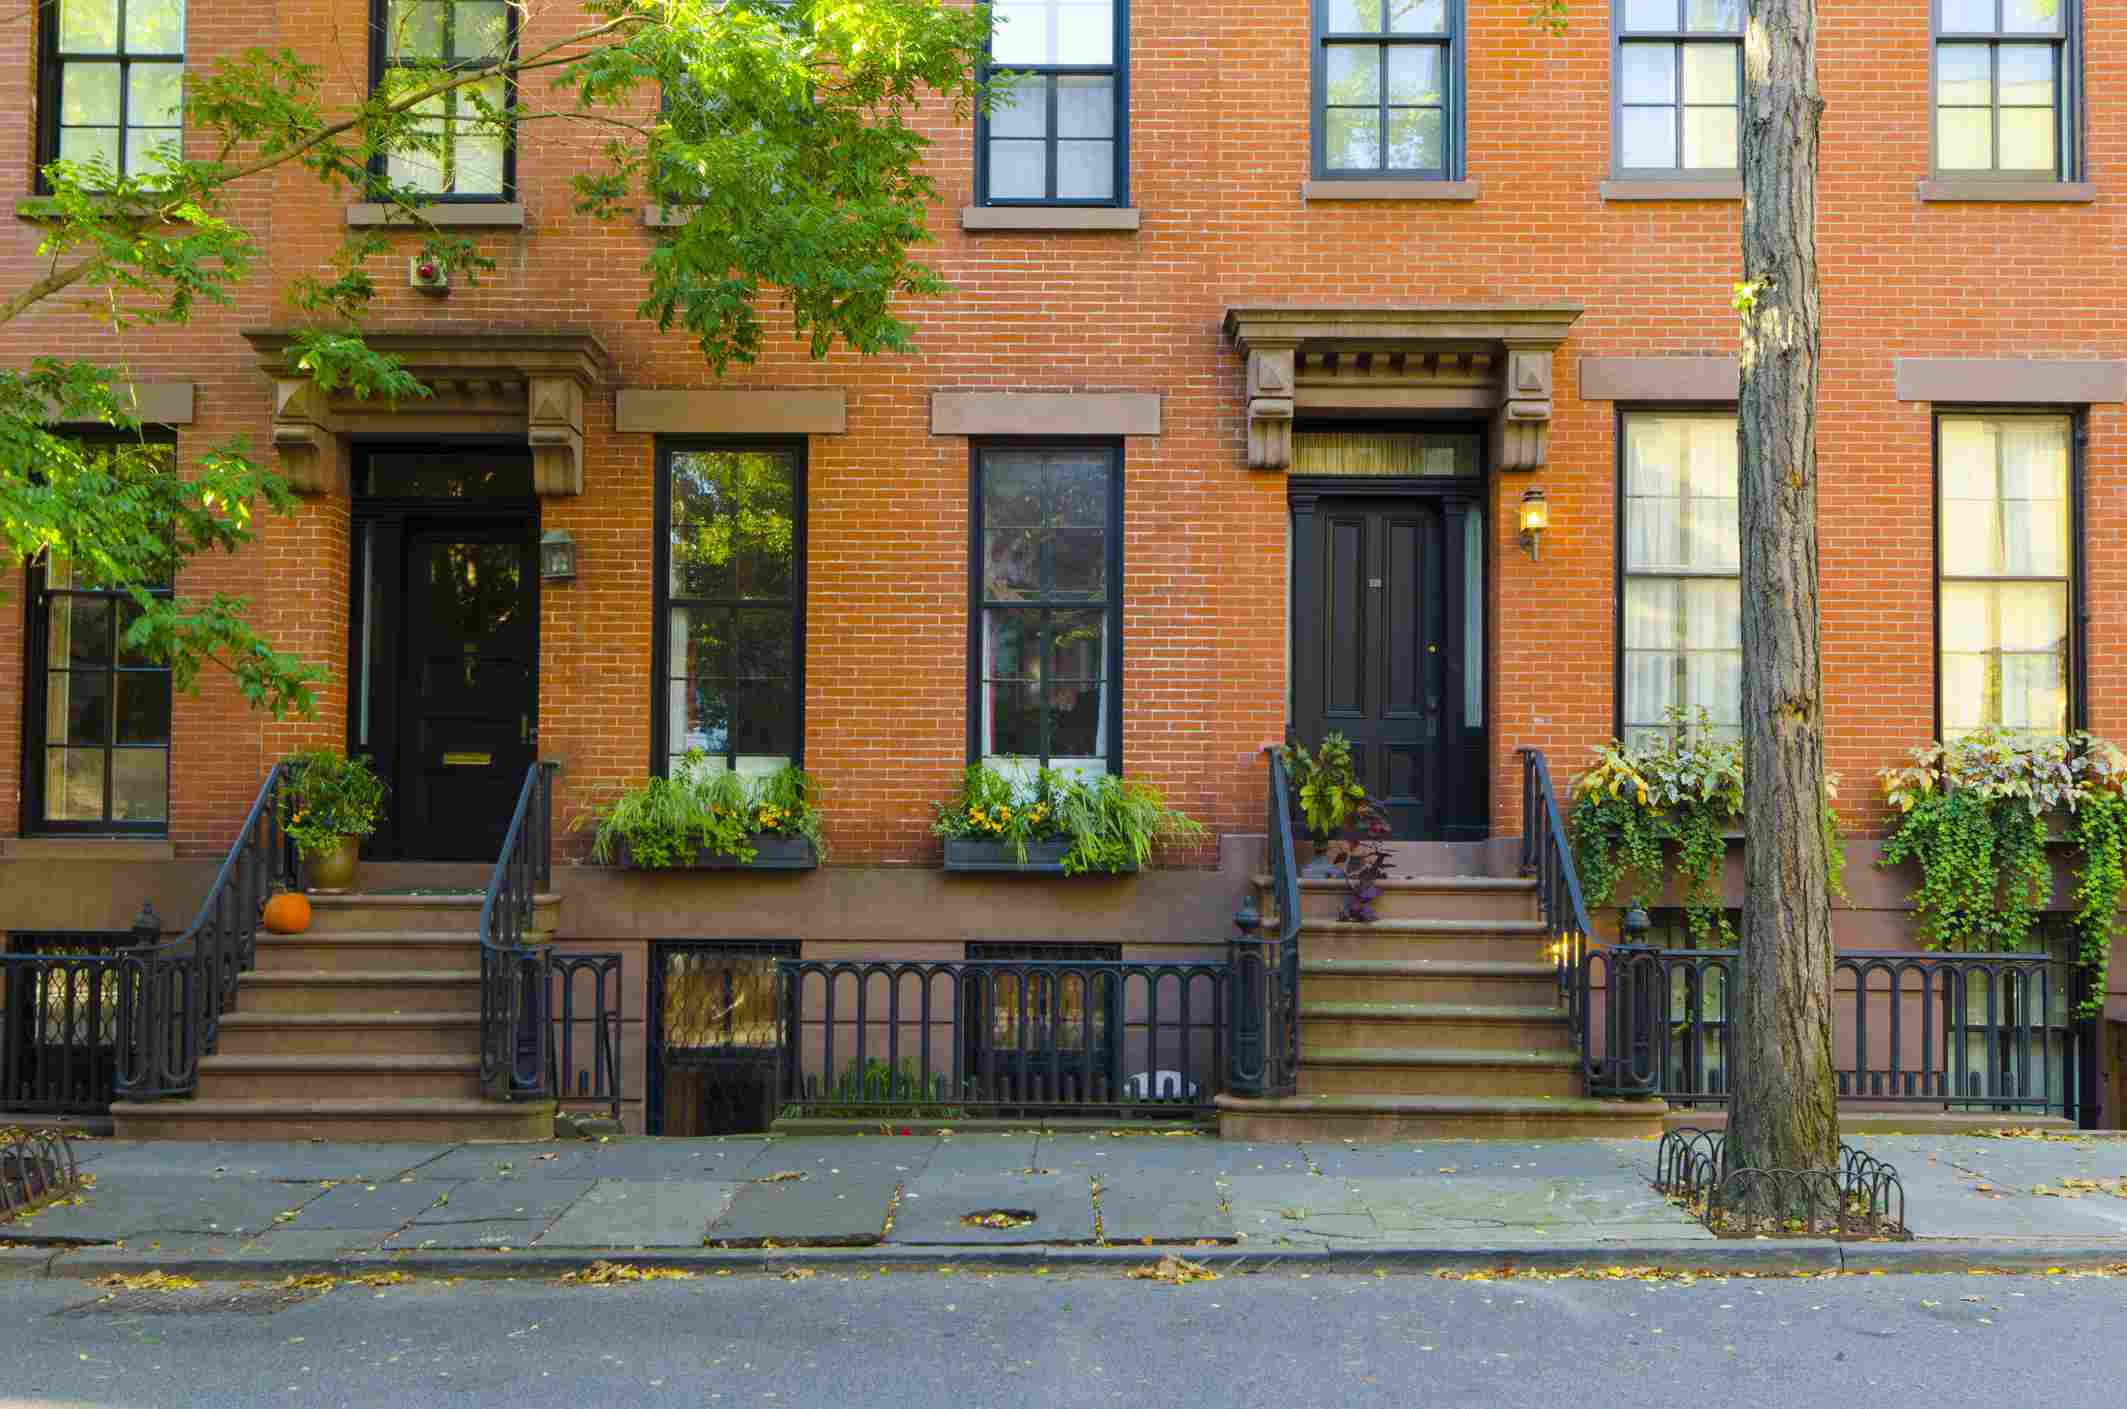 Average Rents in Brooklyn Neighborhoods